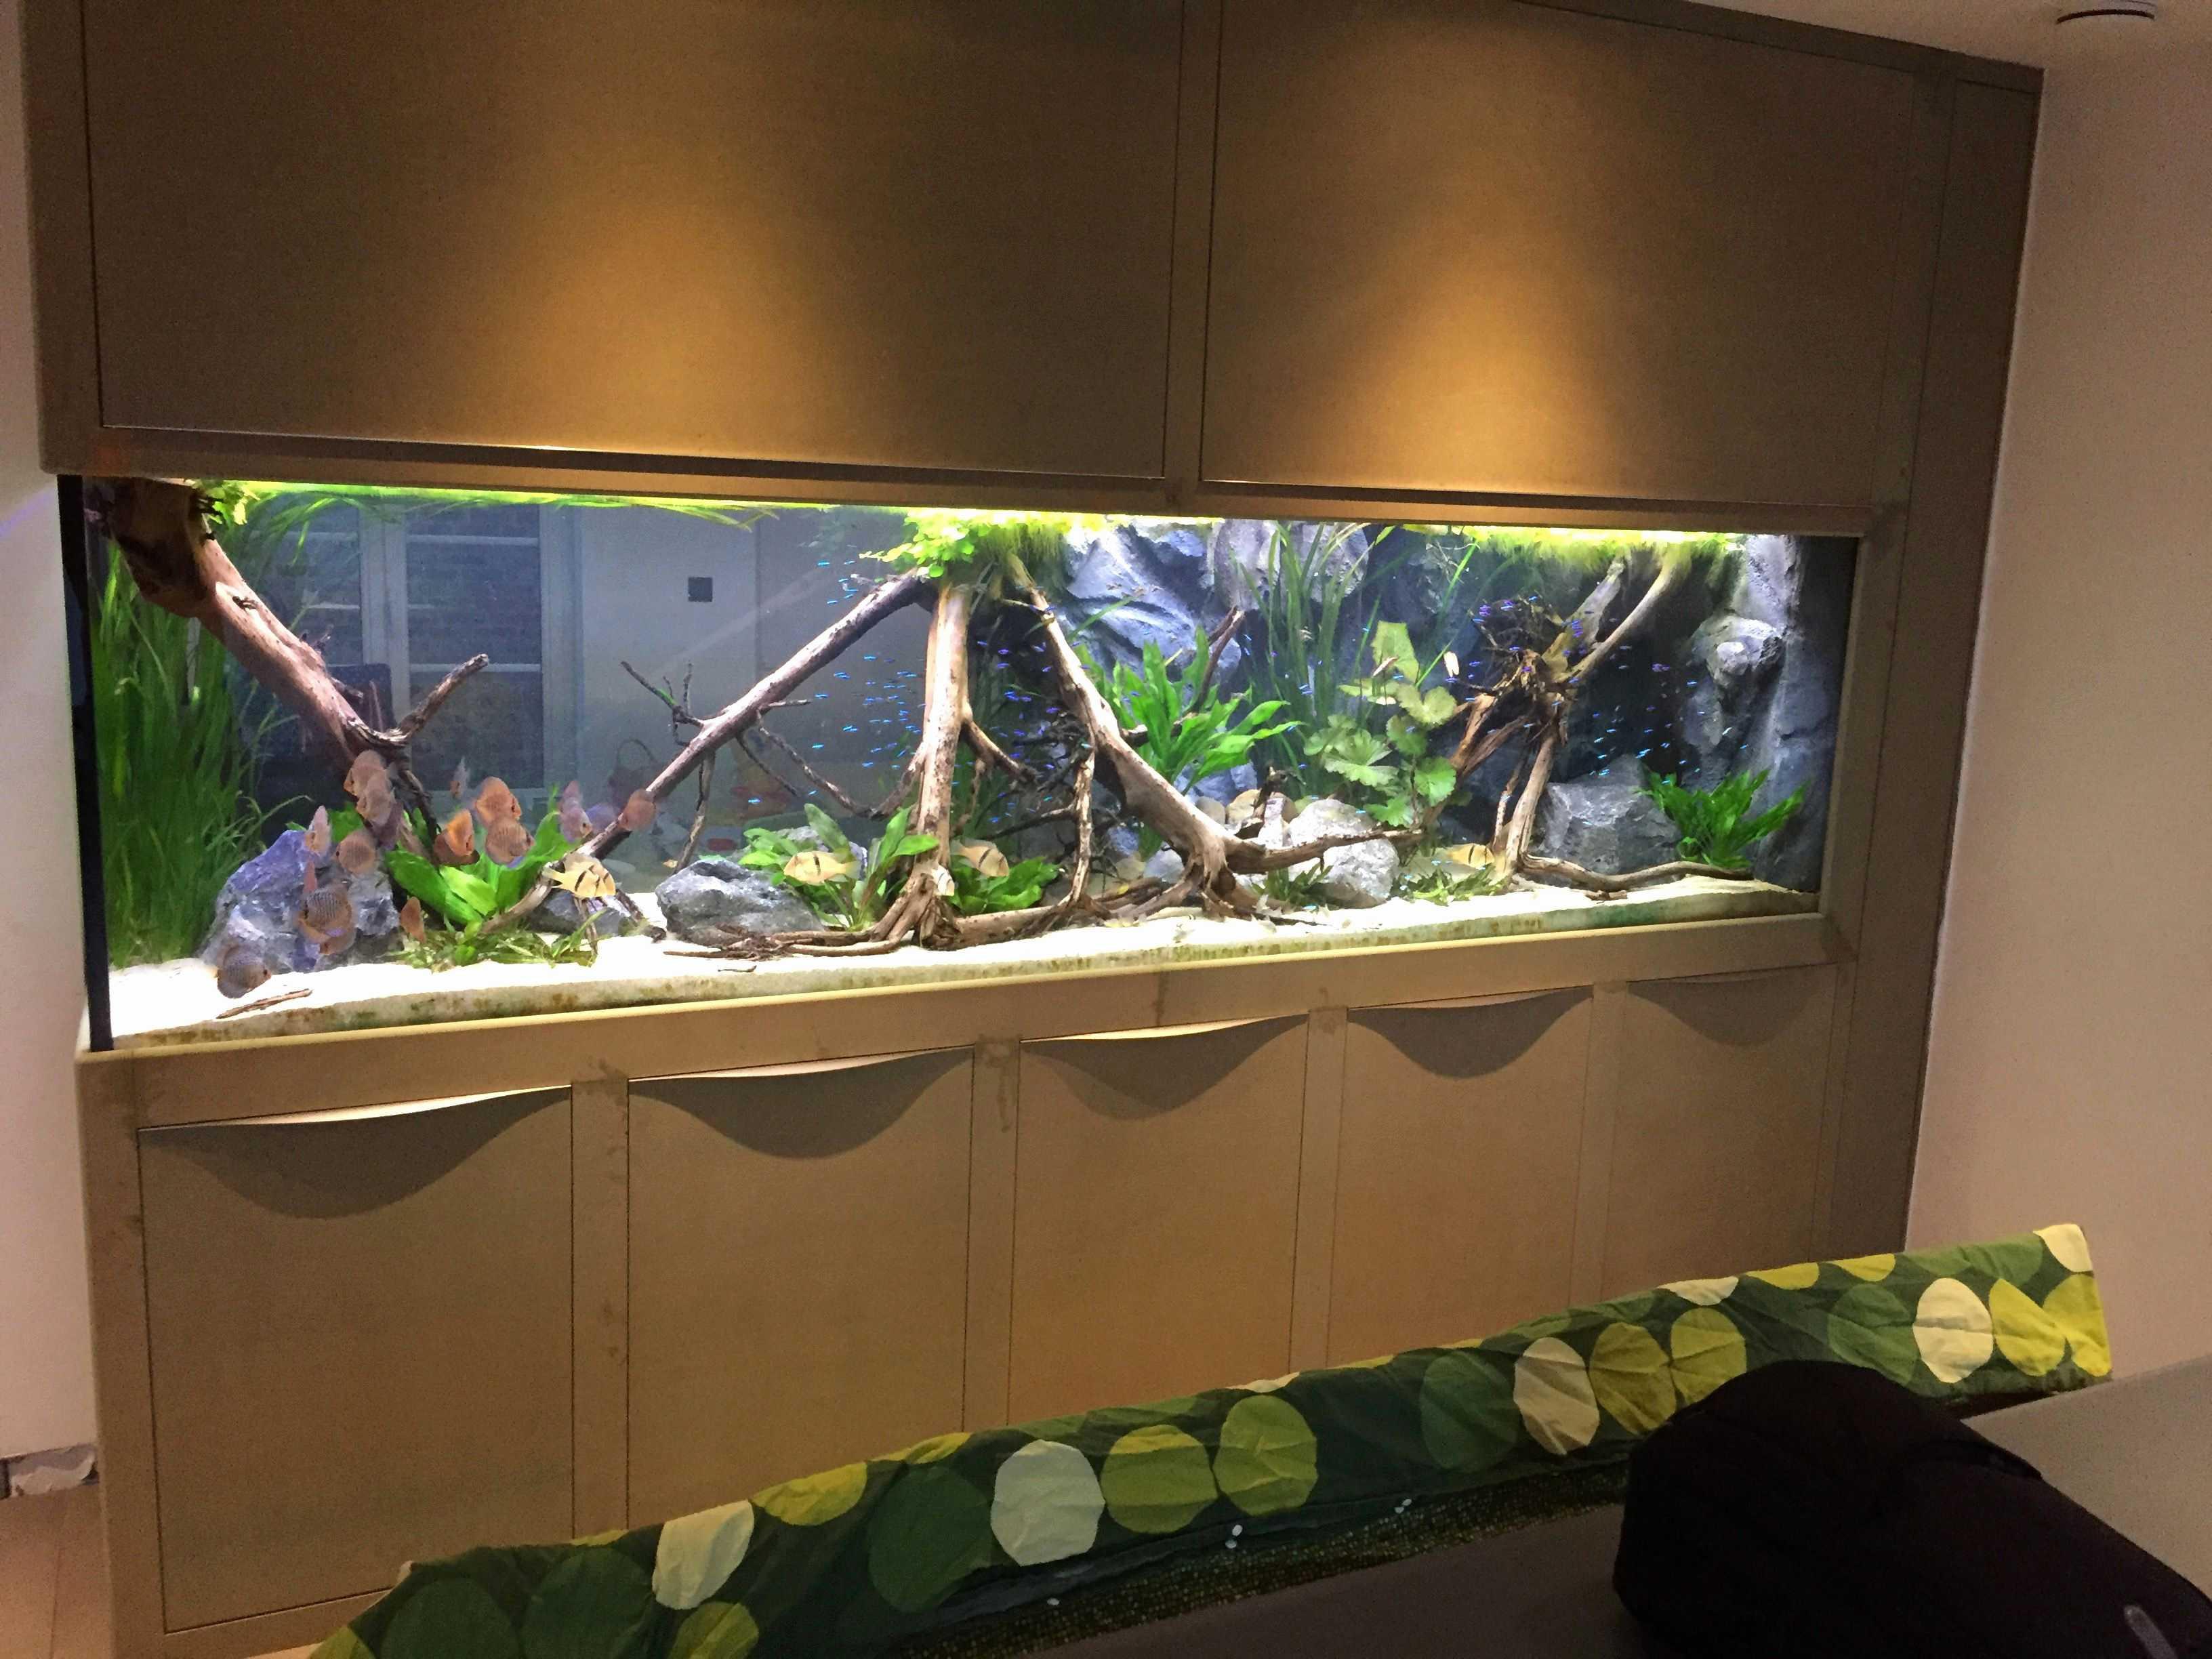 100 Concept Meuble Aquarium Pas Cher Destine Aquarium Meuble Pas Cher Agencecormierdelauniere Com Agencecormierdelauniere Com